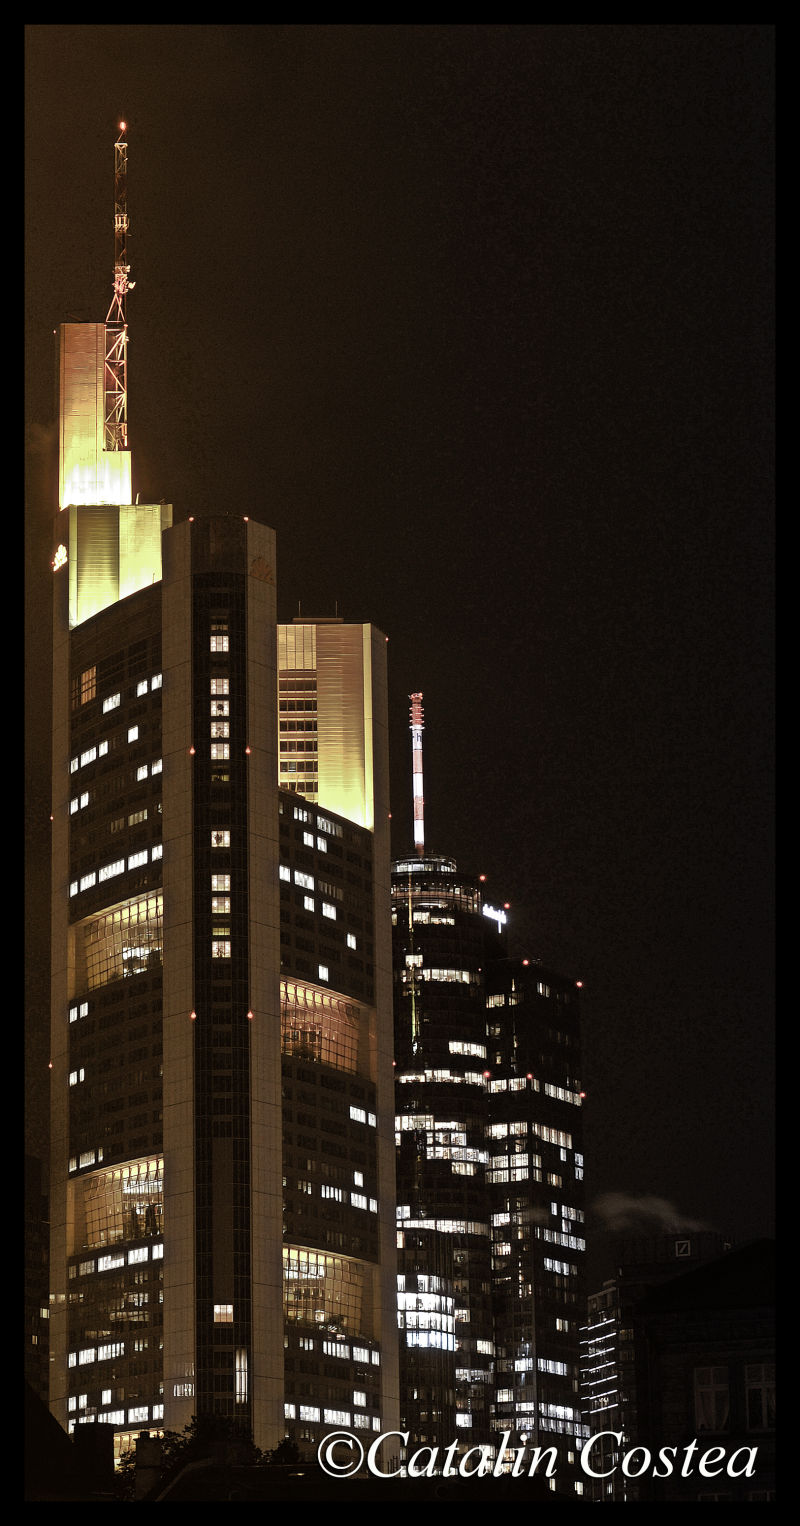 On the streets of Frankfurt - Tower III